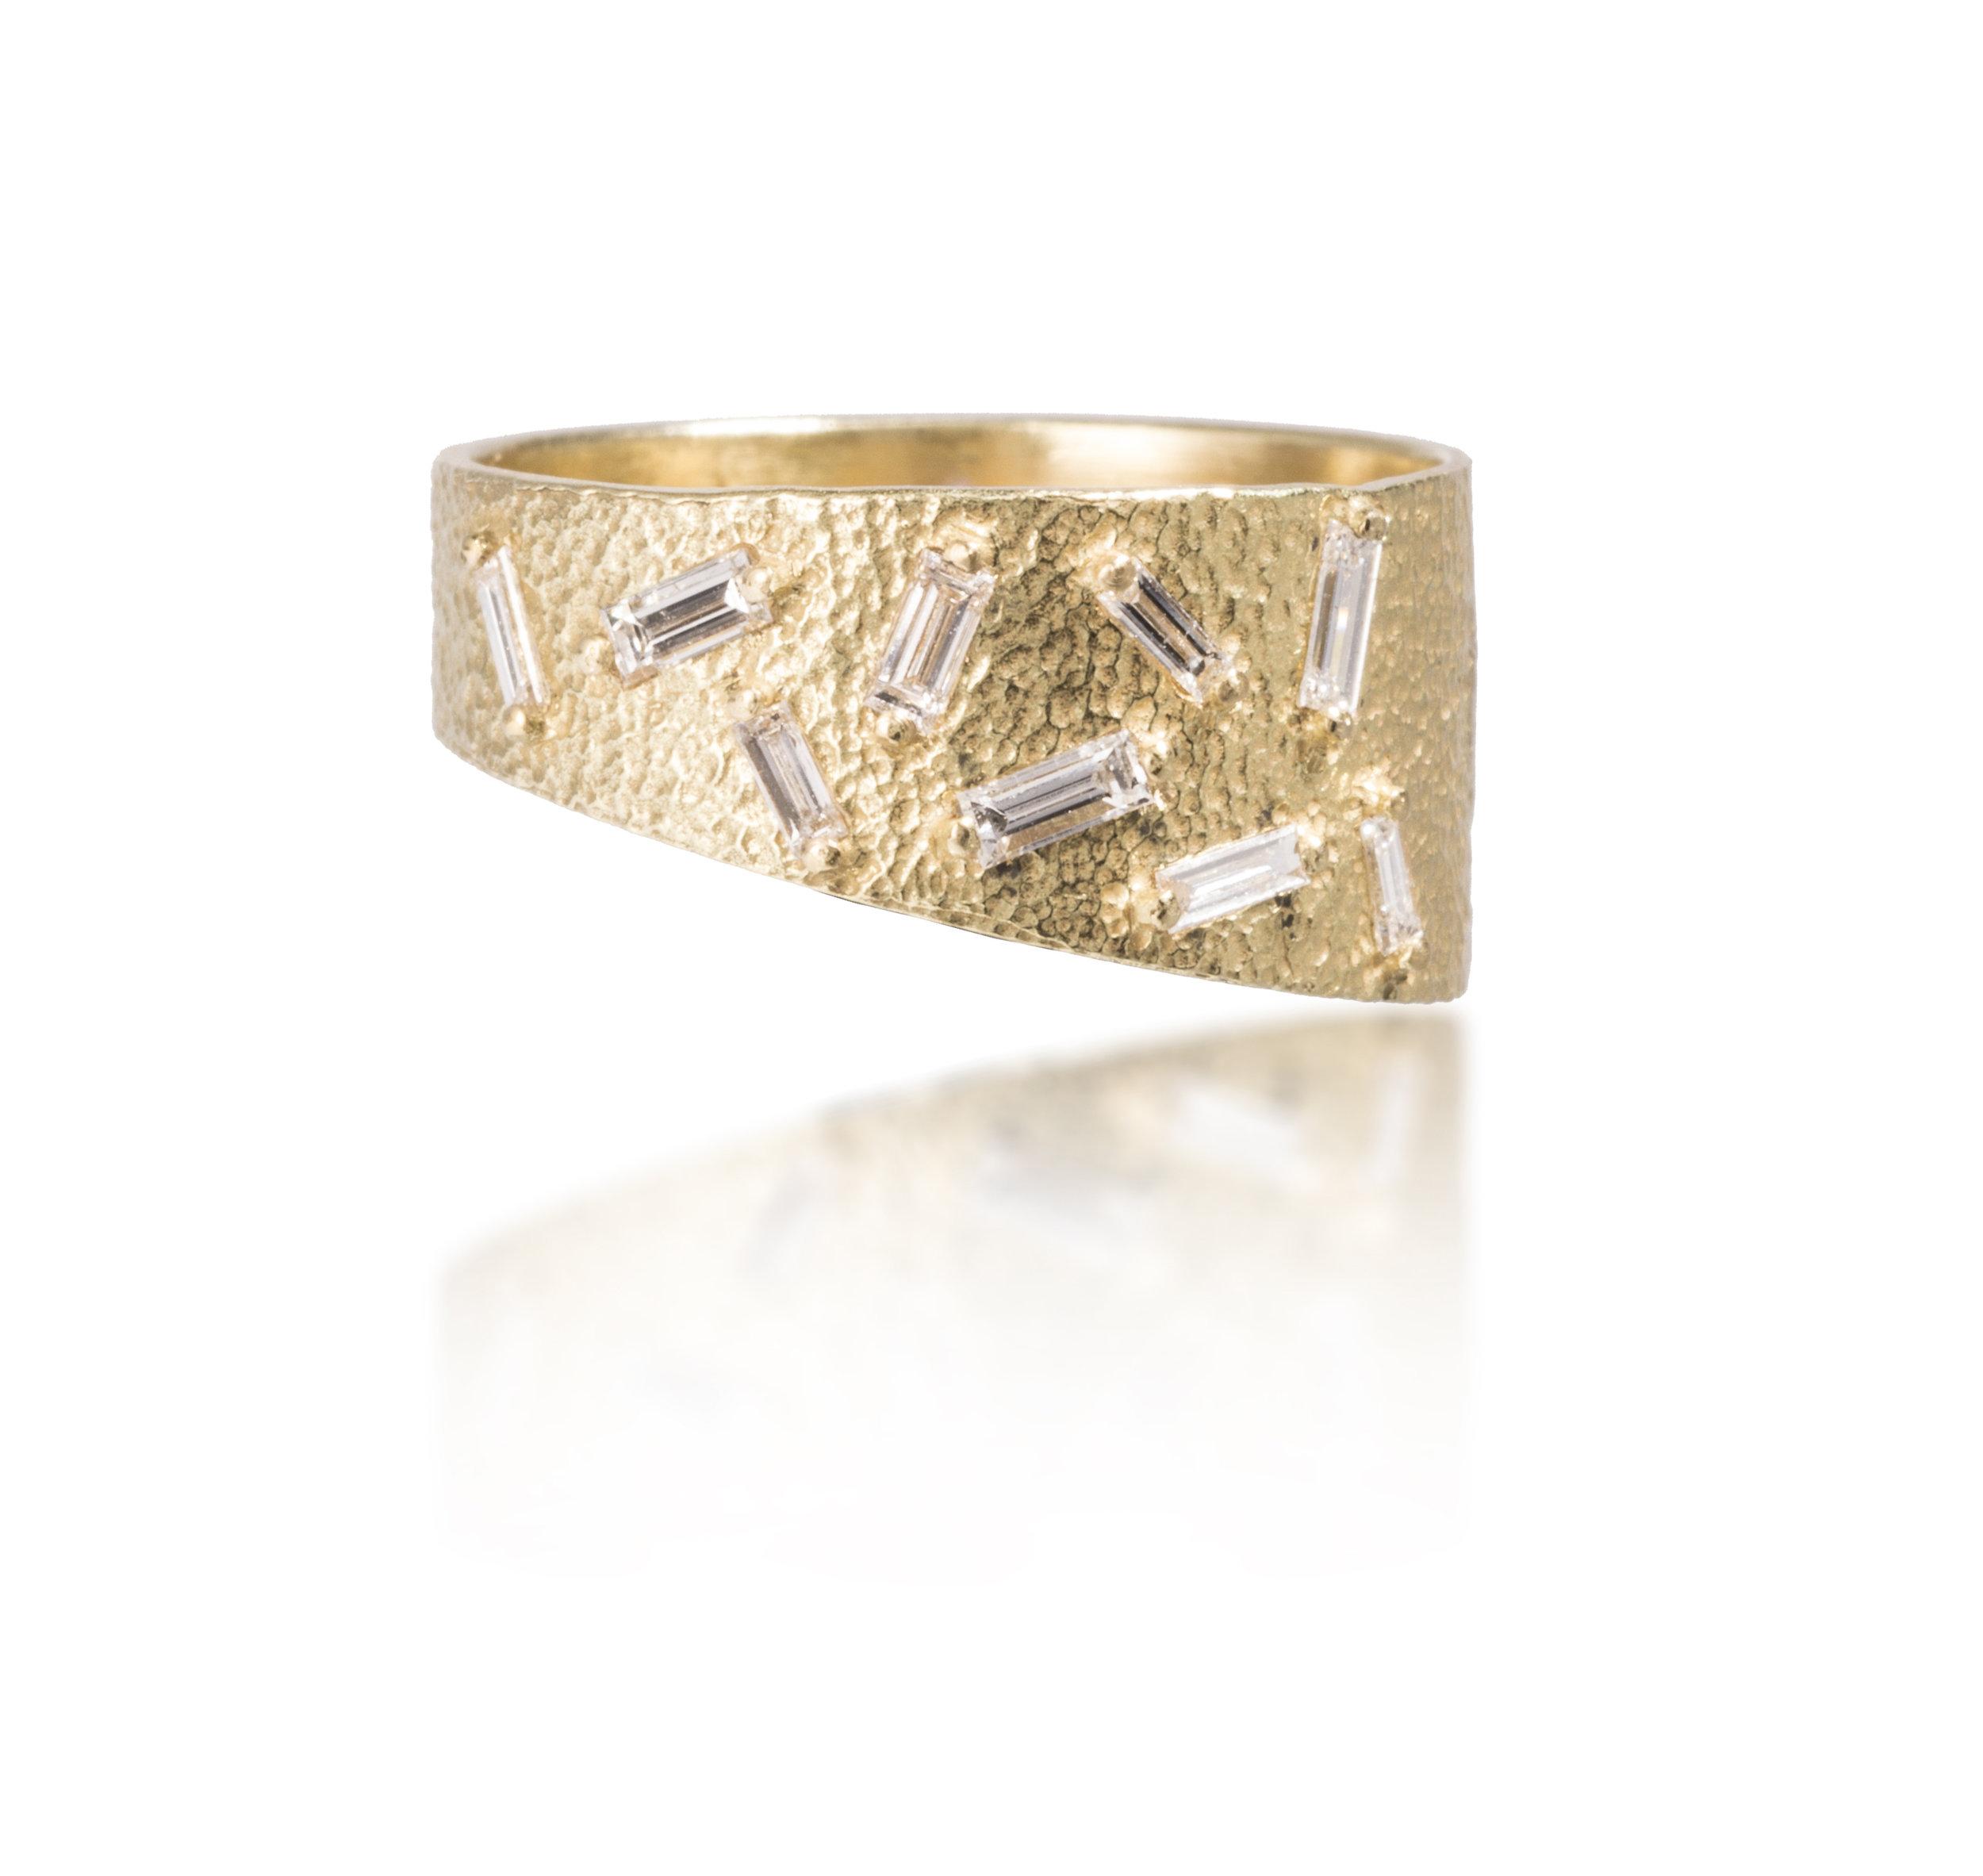 Ice Ring - $1700